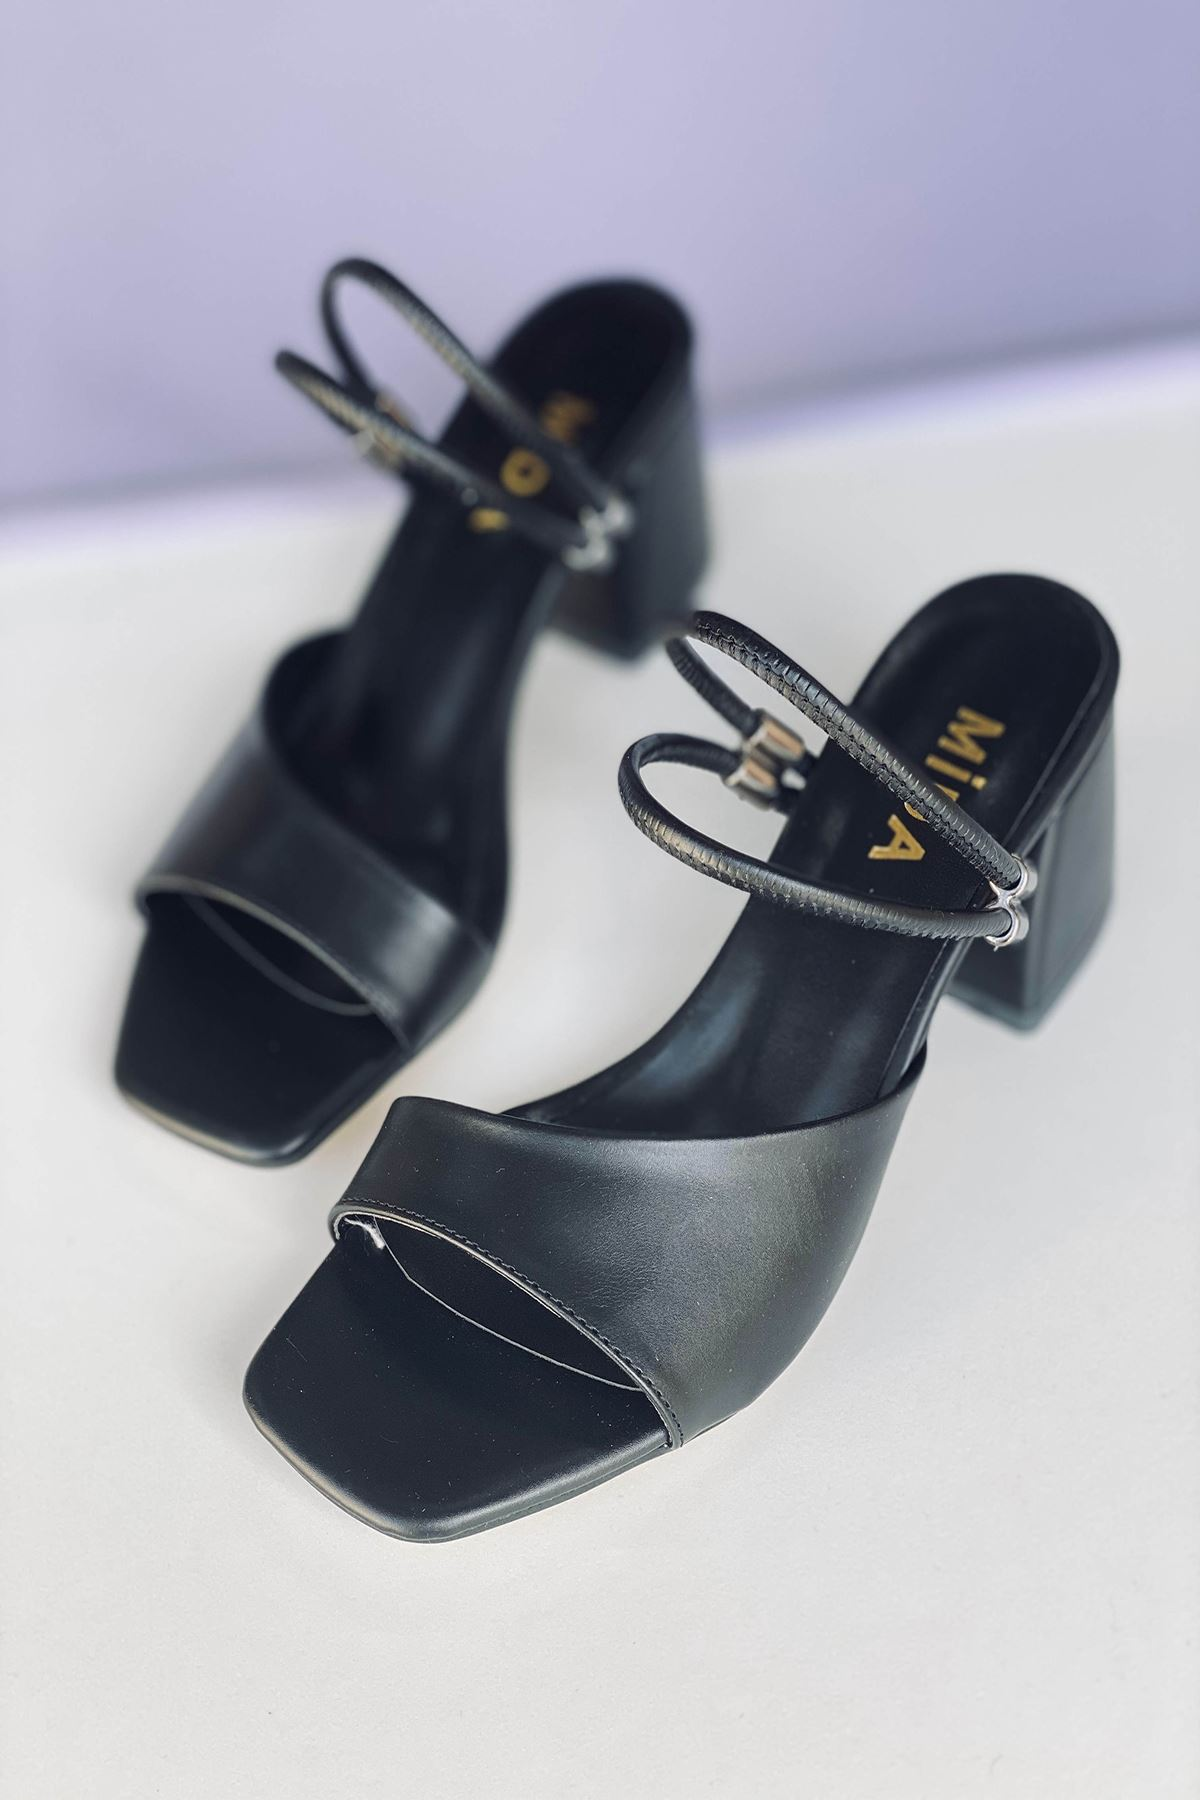 Y911 Siyah Deri Topuklu Ayakkabı